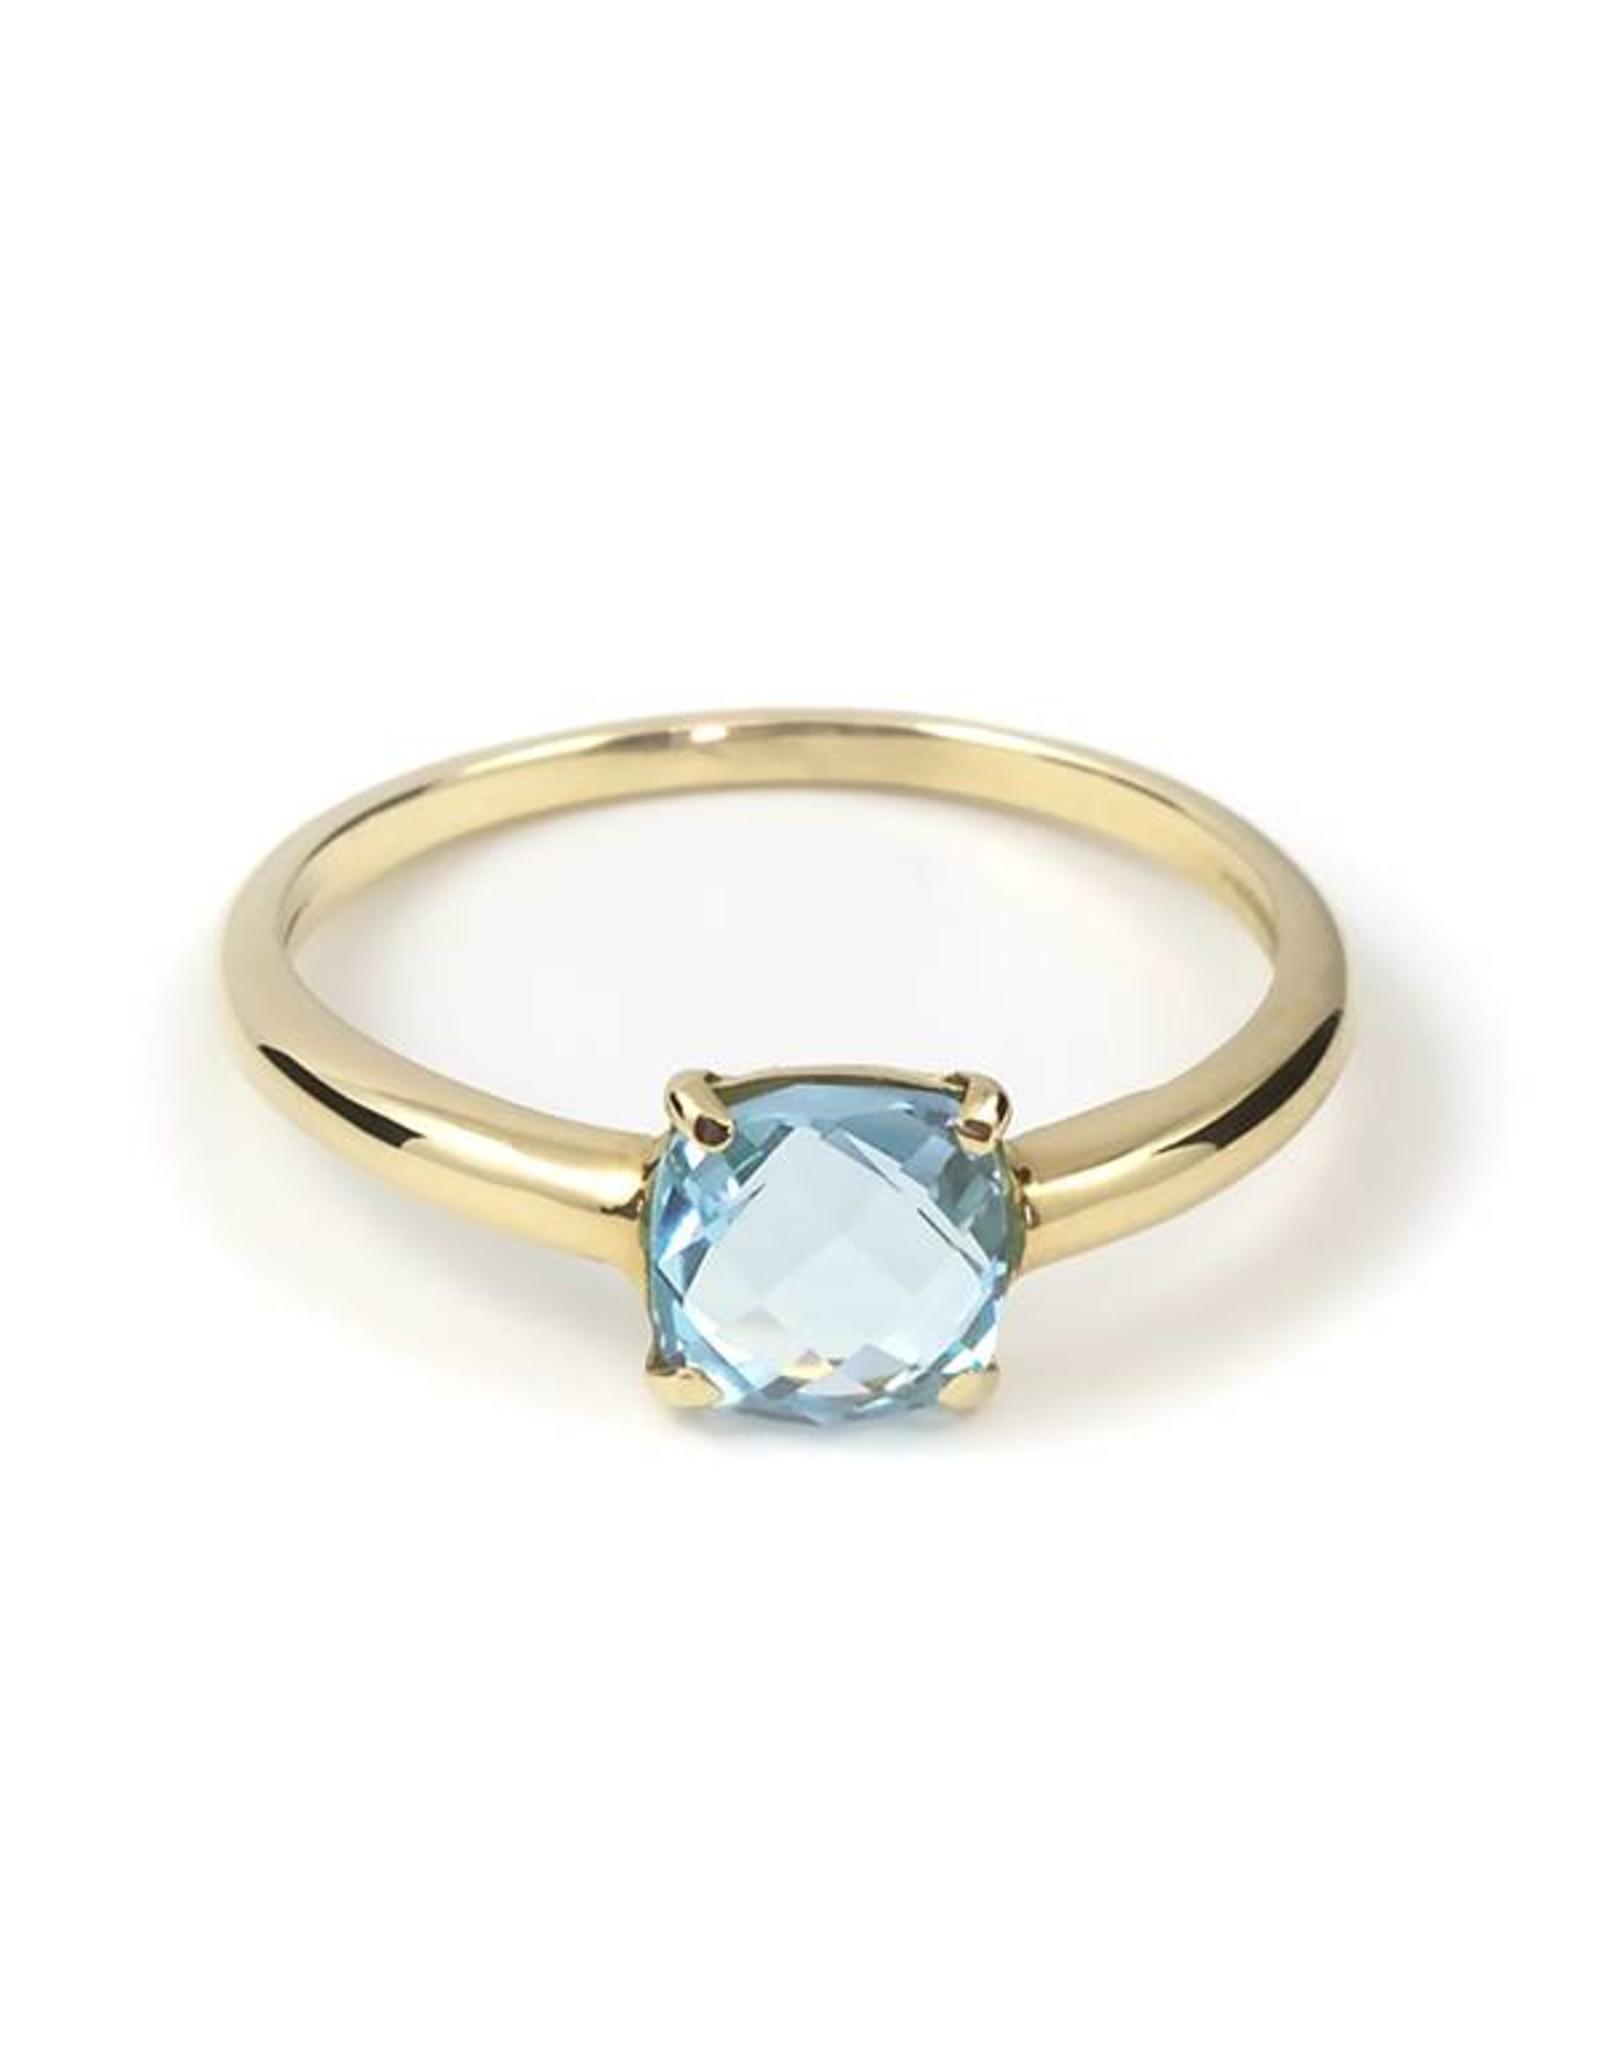 Navarro Ring - Goud + blauw topaas